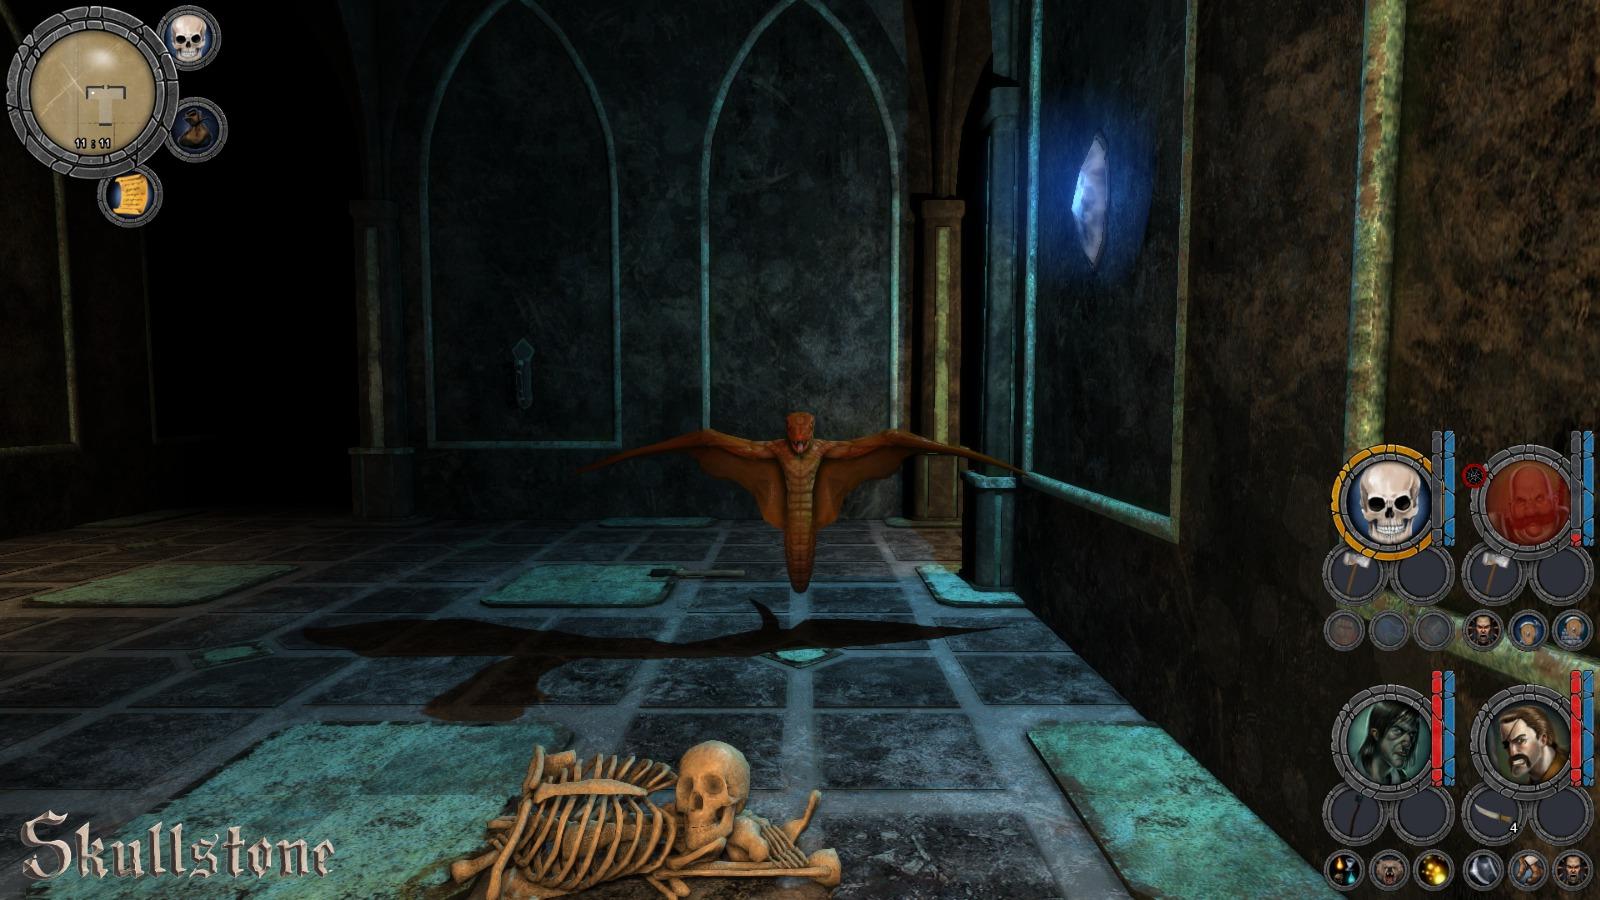 skullstone_dungeonB_dead.jpg